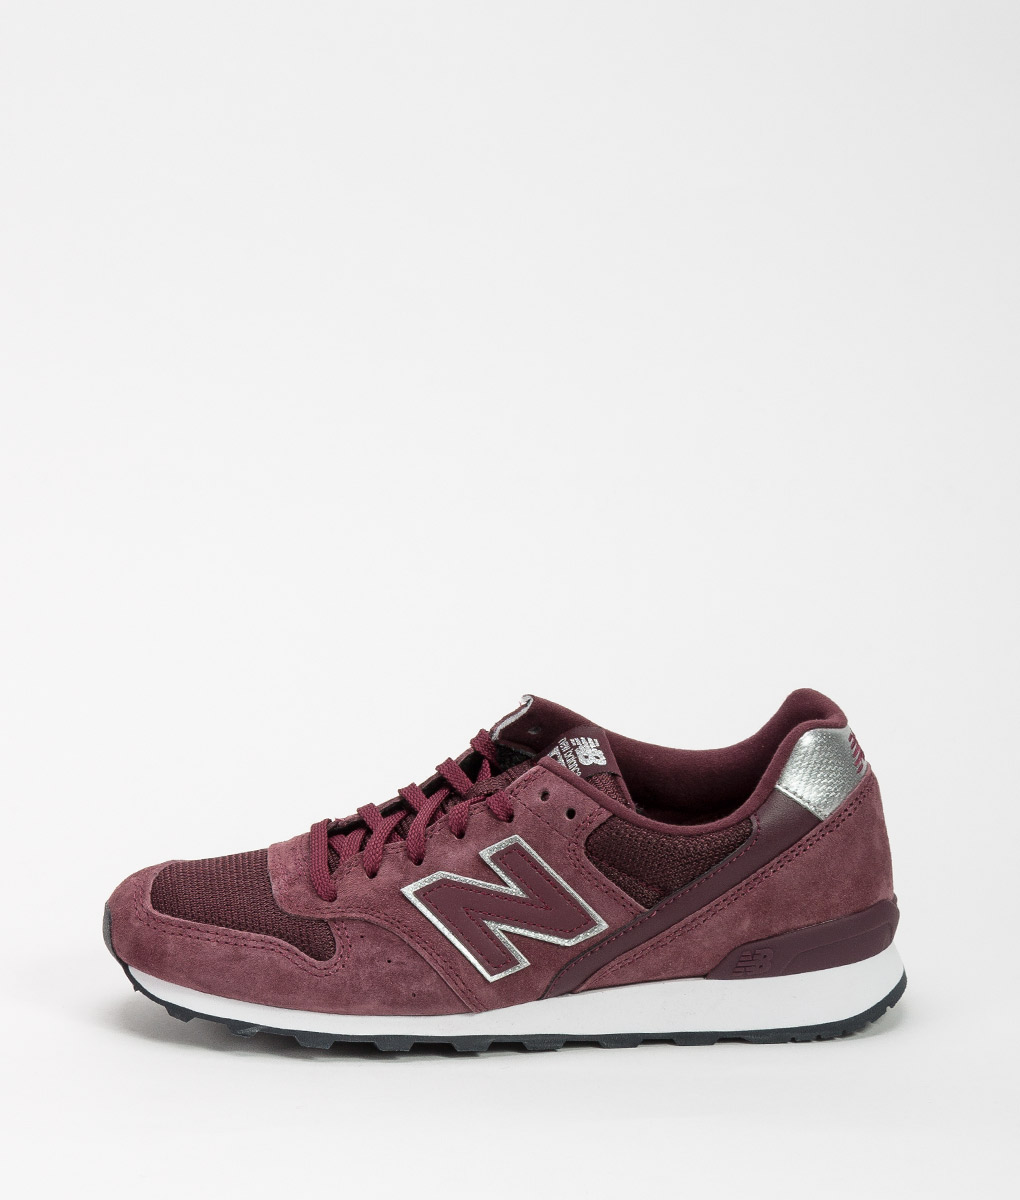 discount 77286 c9467 NEW BALANCE Women Running Shoes WR996 Burgundy HB 99.99 – T6/8